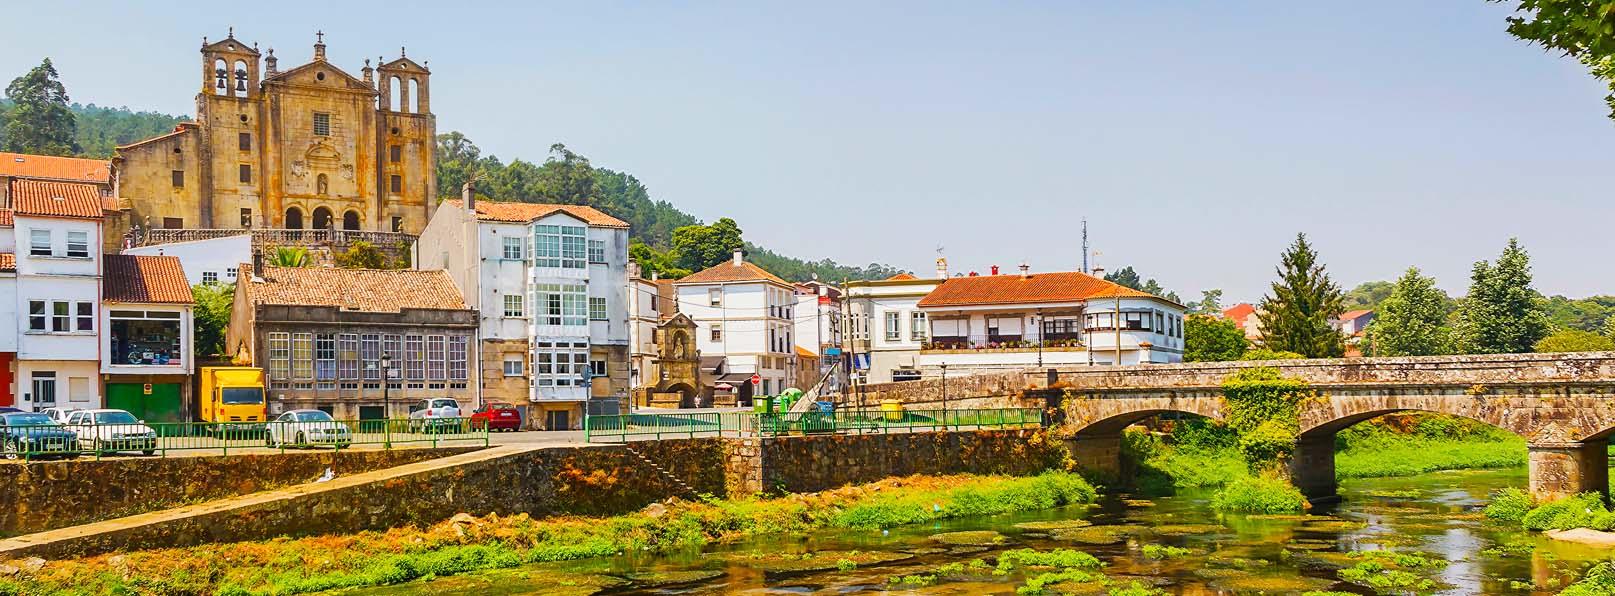 8 Day Camino Portugese walk